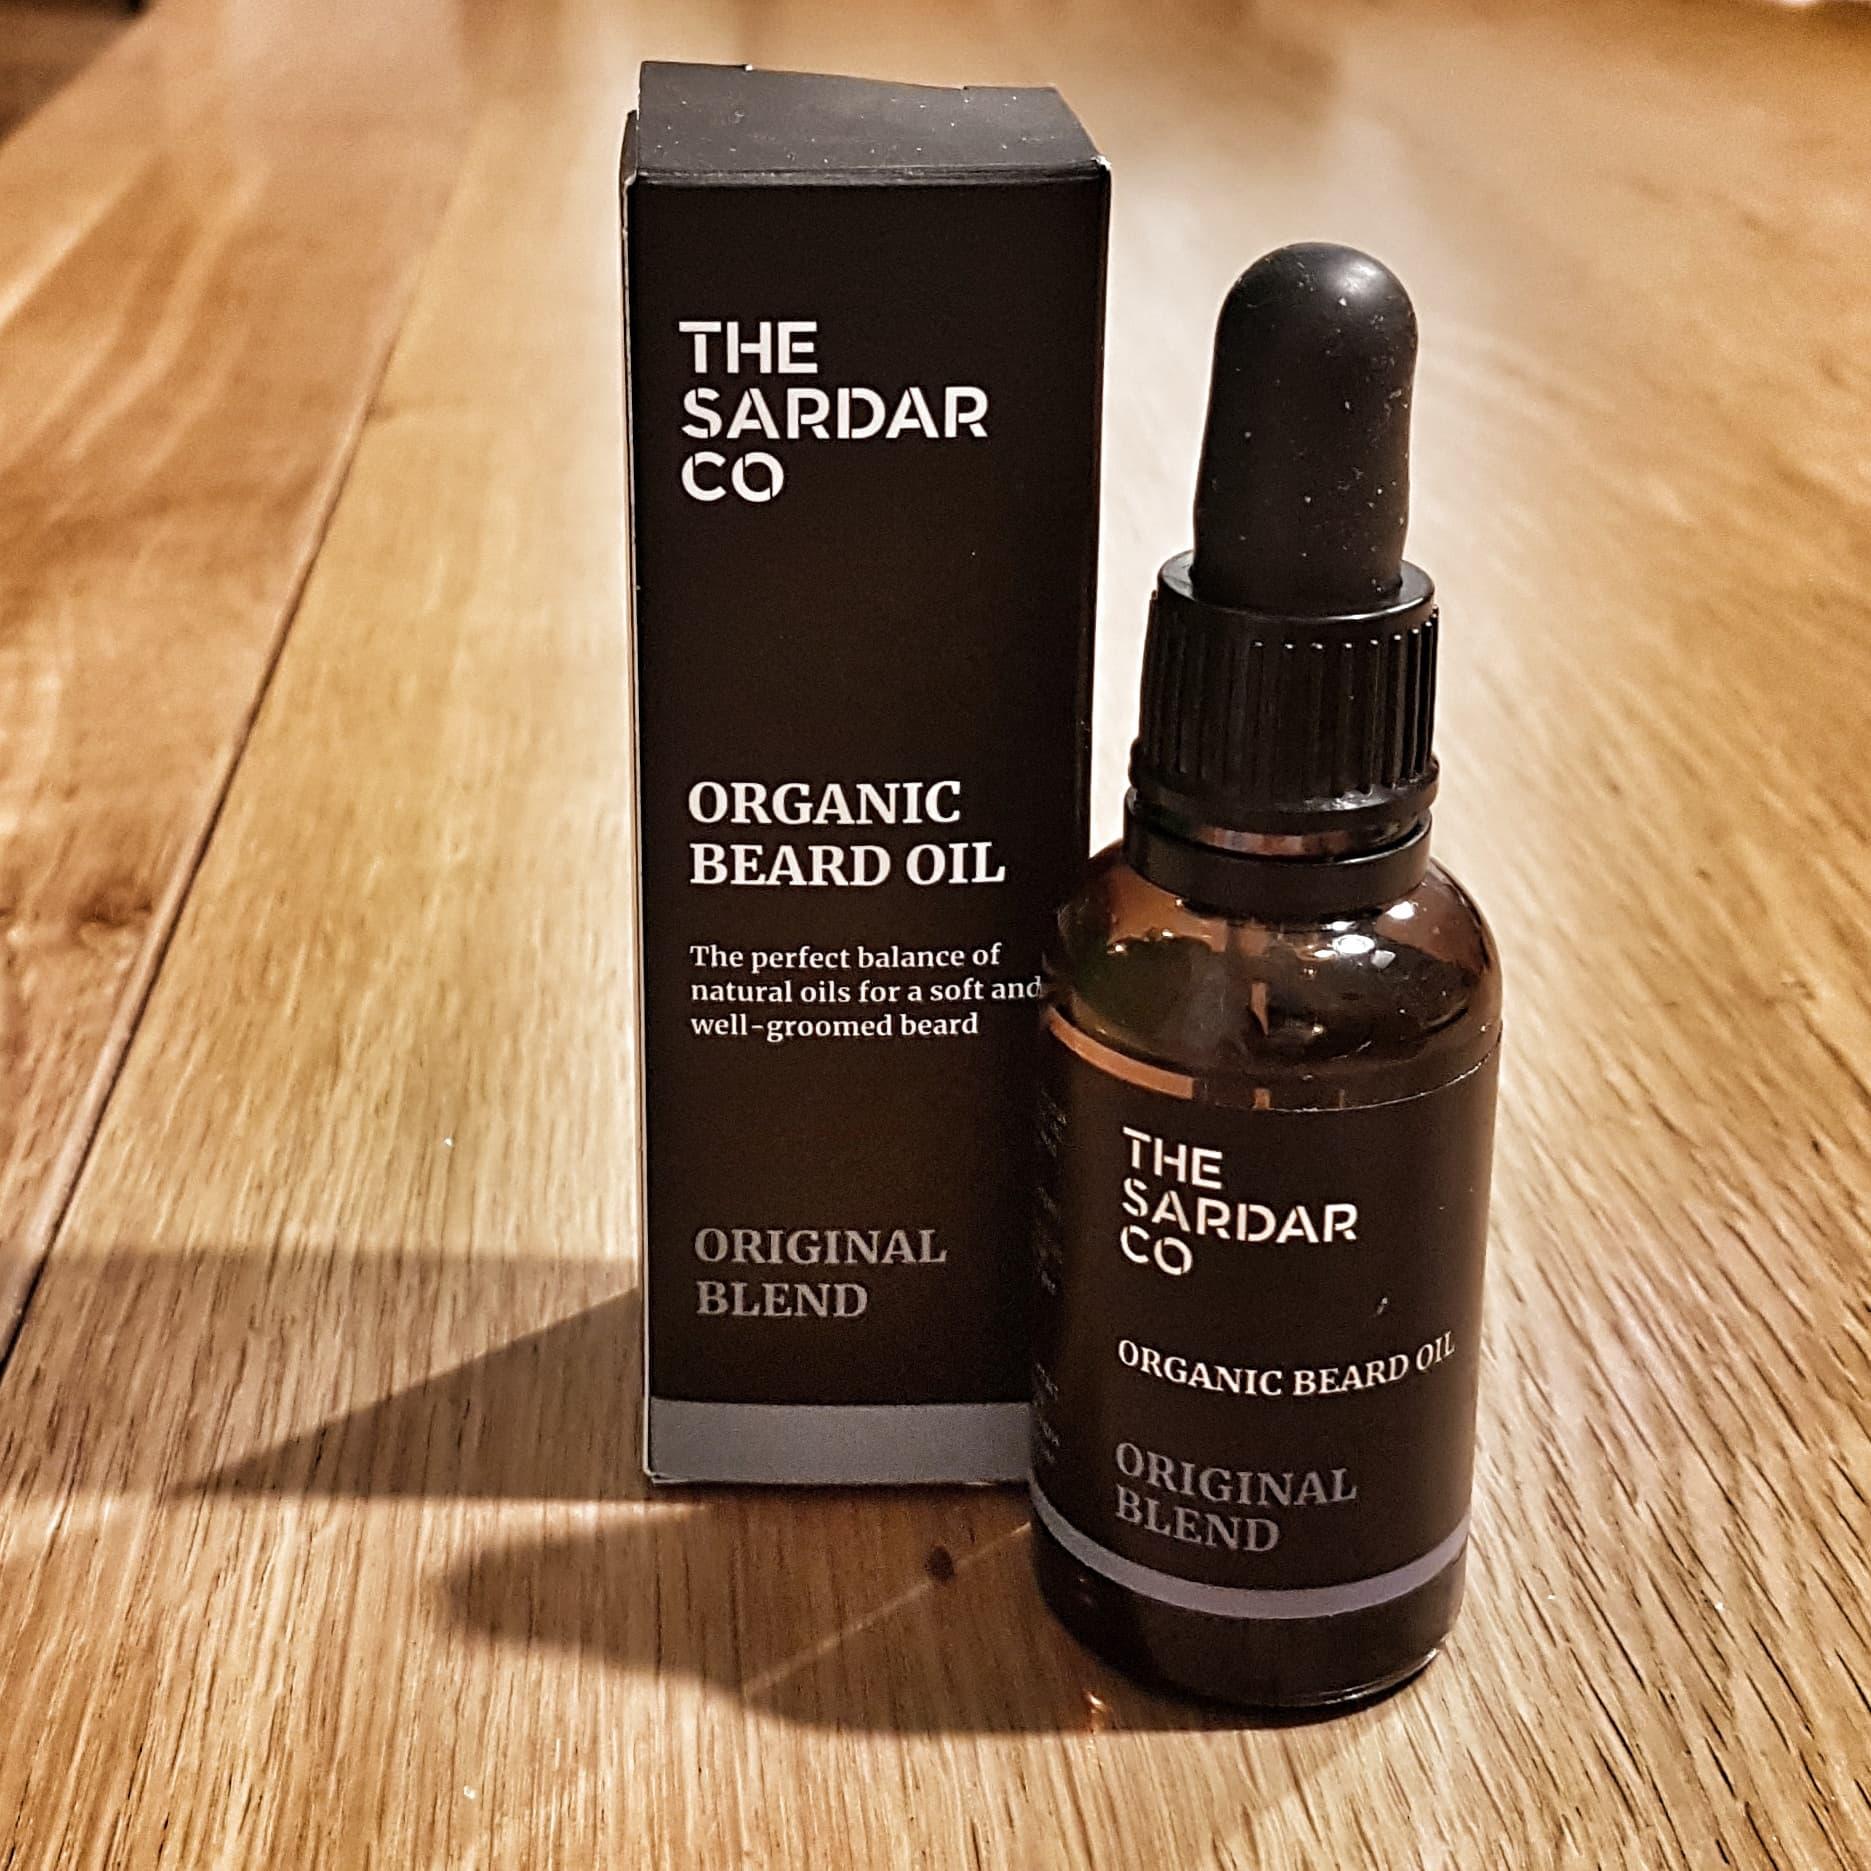 Review of The Sardar Co Original Blend Beard Oil